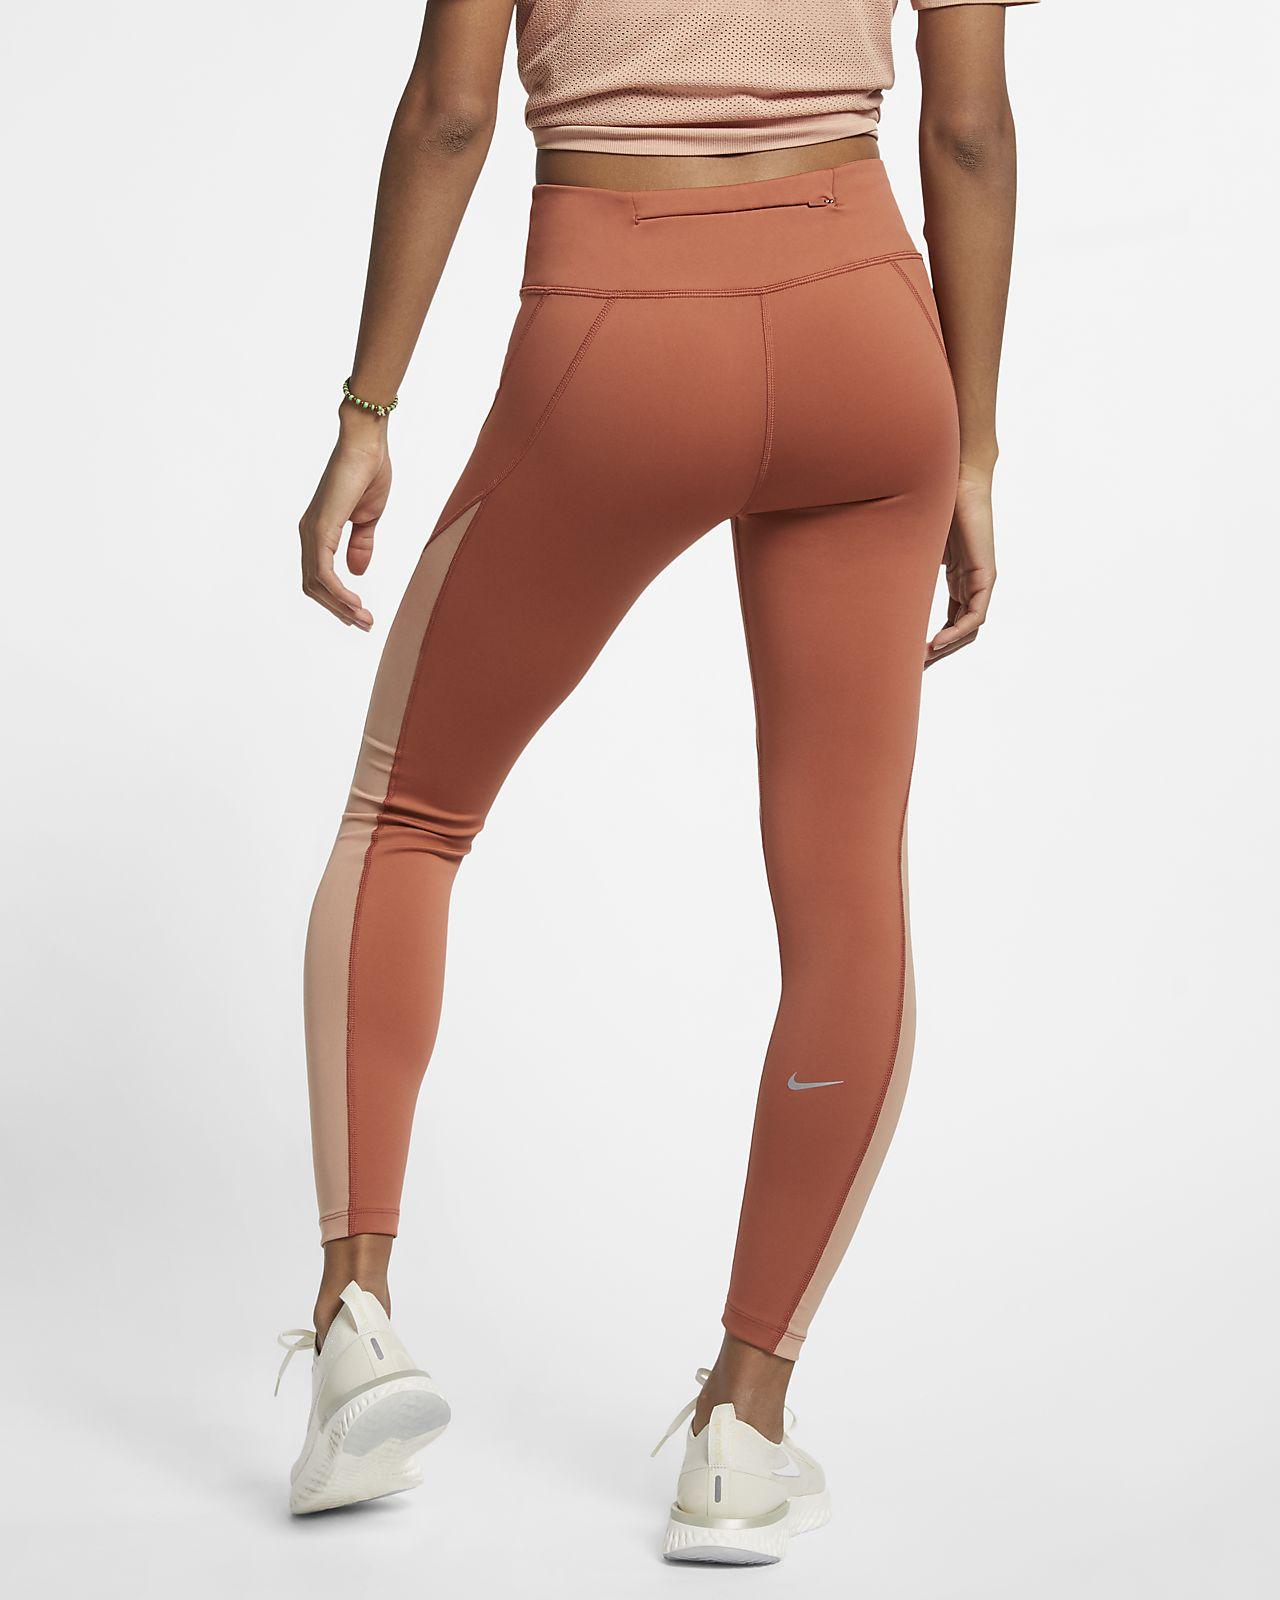 fafb80fe29177 Nike Epic Lux Women's 7/8 Running Tights. Nike.com GB